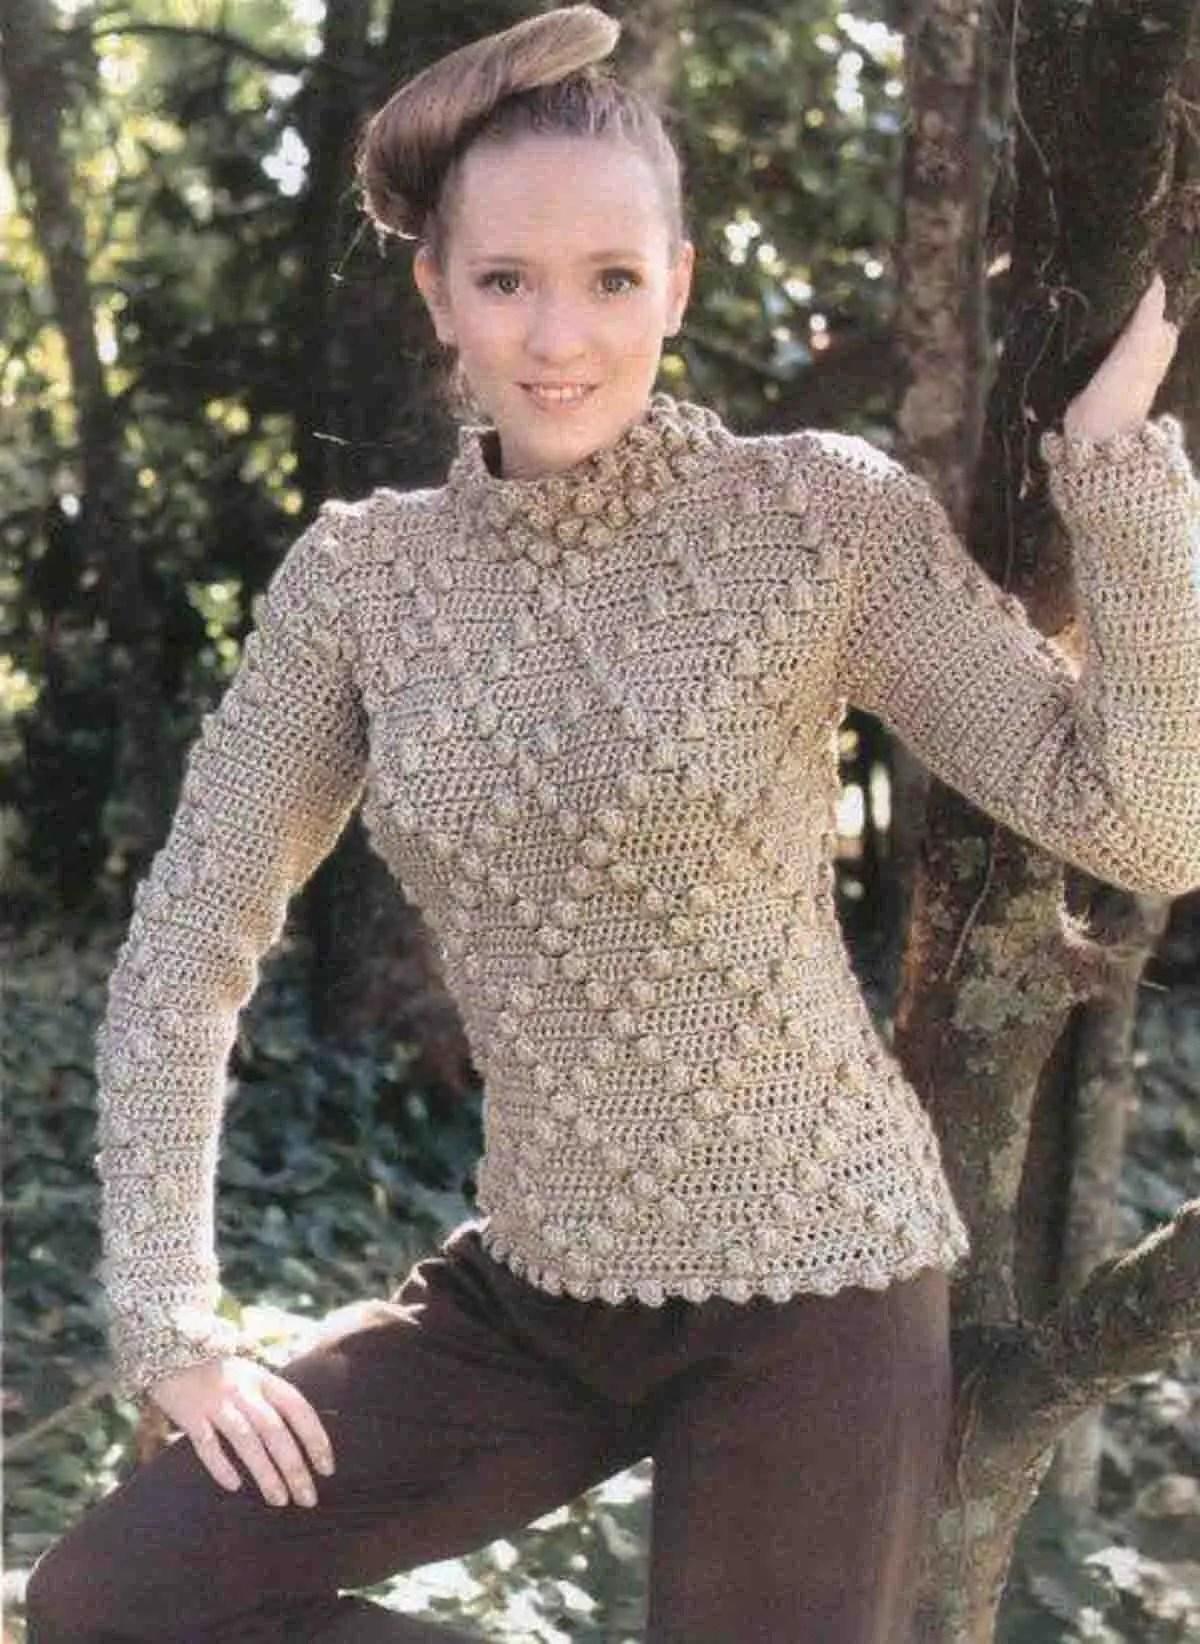 Crochet un pull très chic